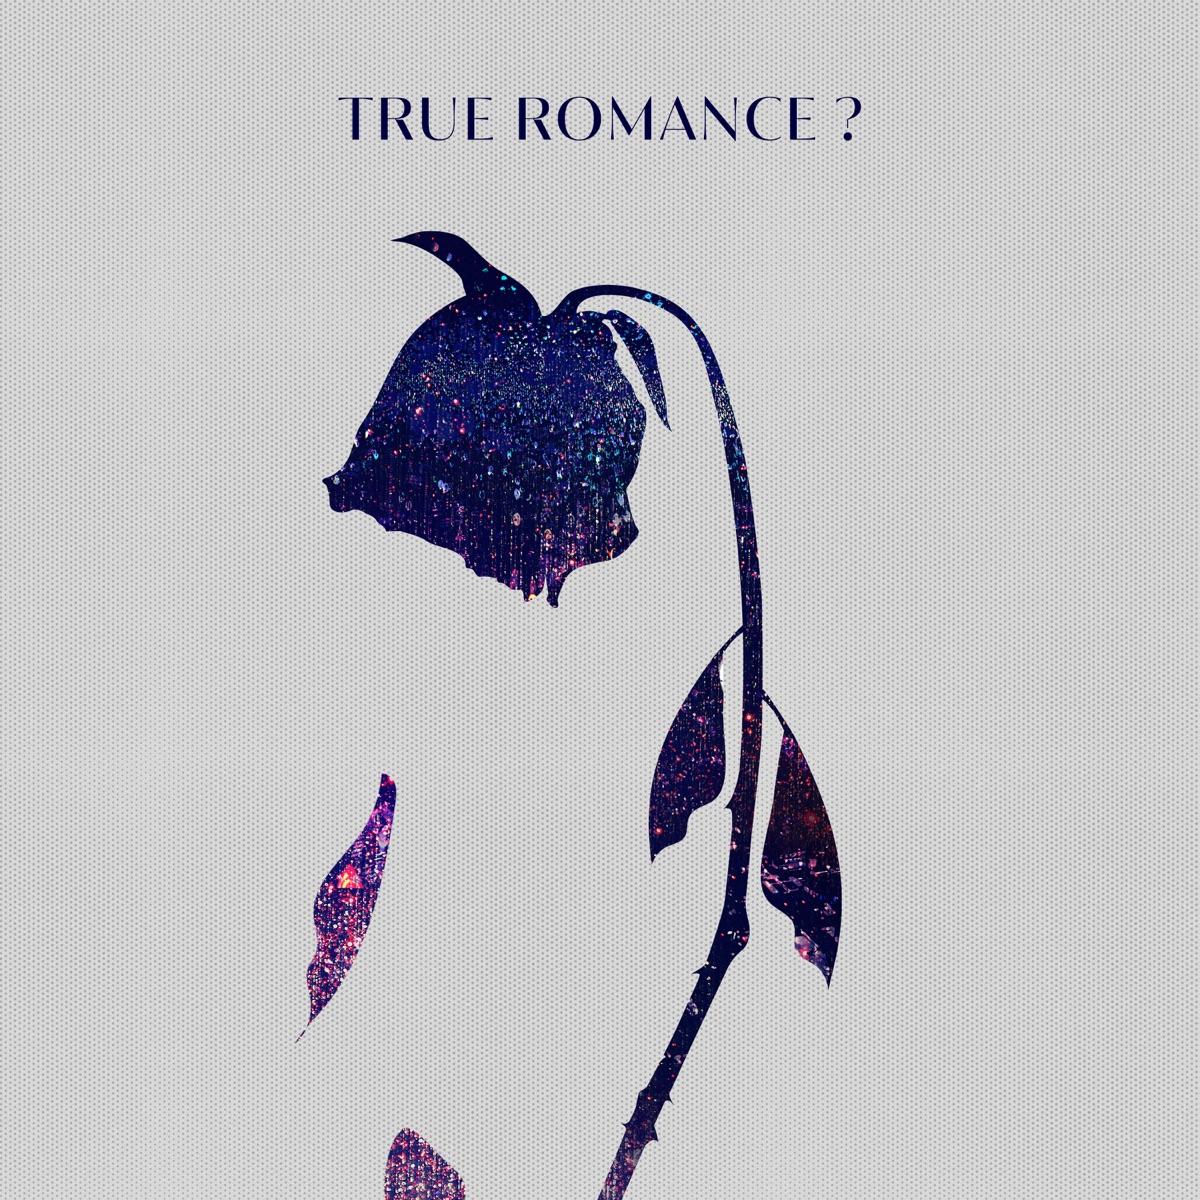 『GeG & WILYWNKA - True Romance? (feat. Hiplin)』収録の『True Romance? (feat. Hiplin)』ジャケット